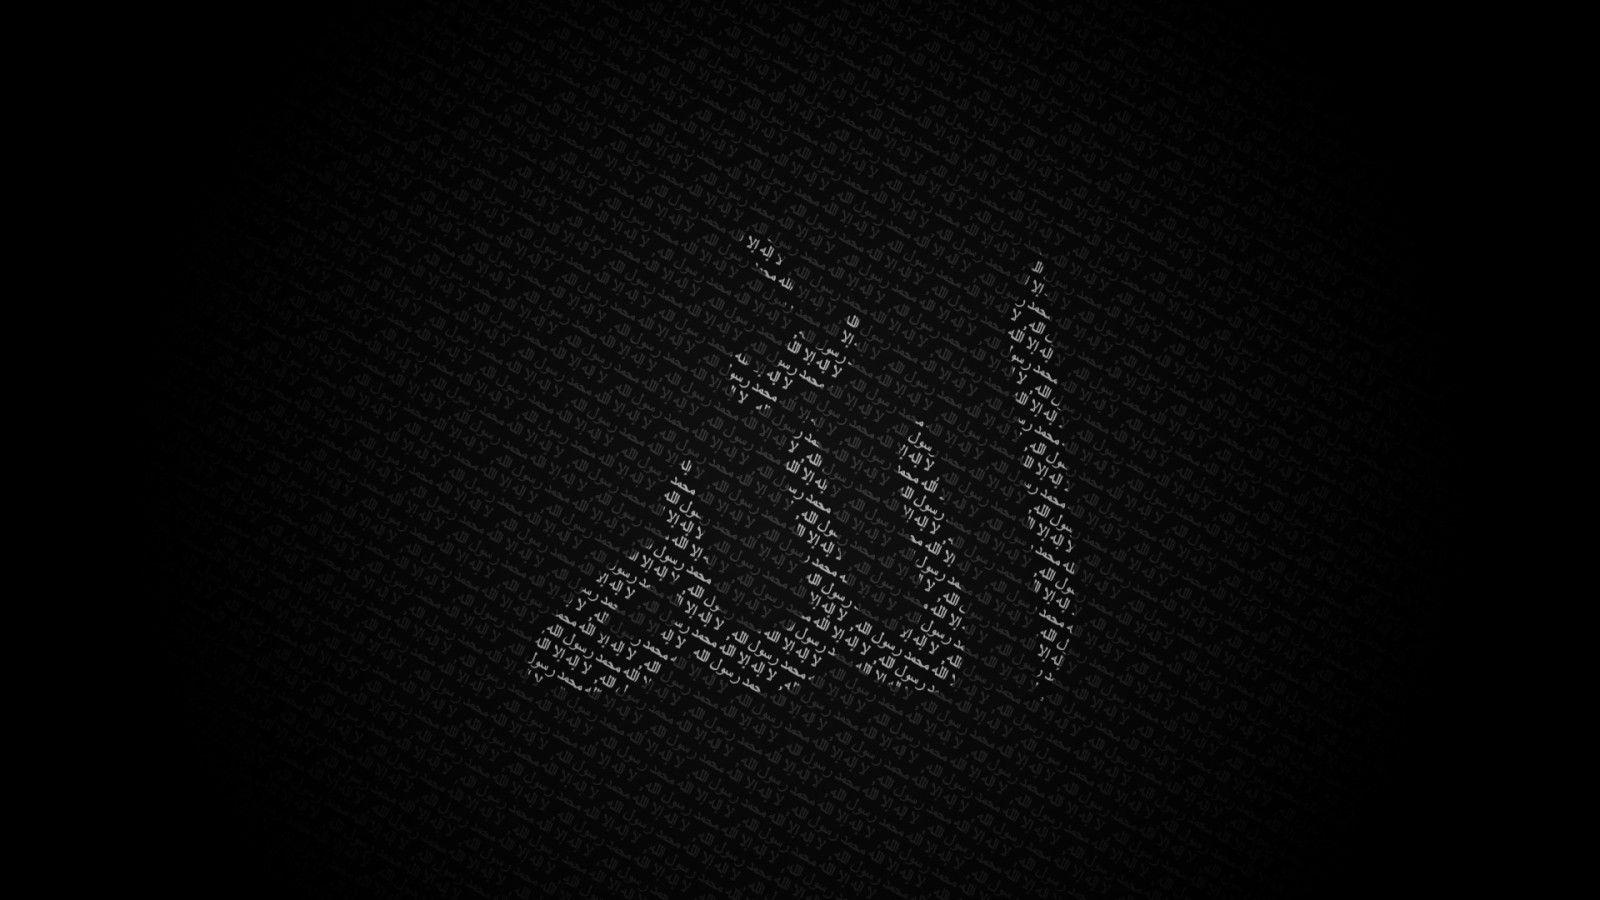 Hd wallpaper black and white - Islam Allah Black And White Hd Wallpaper